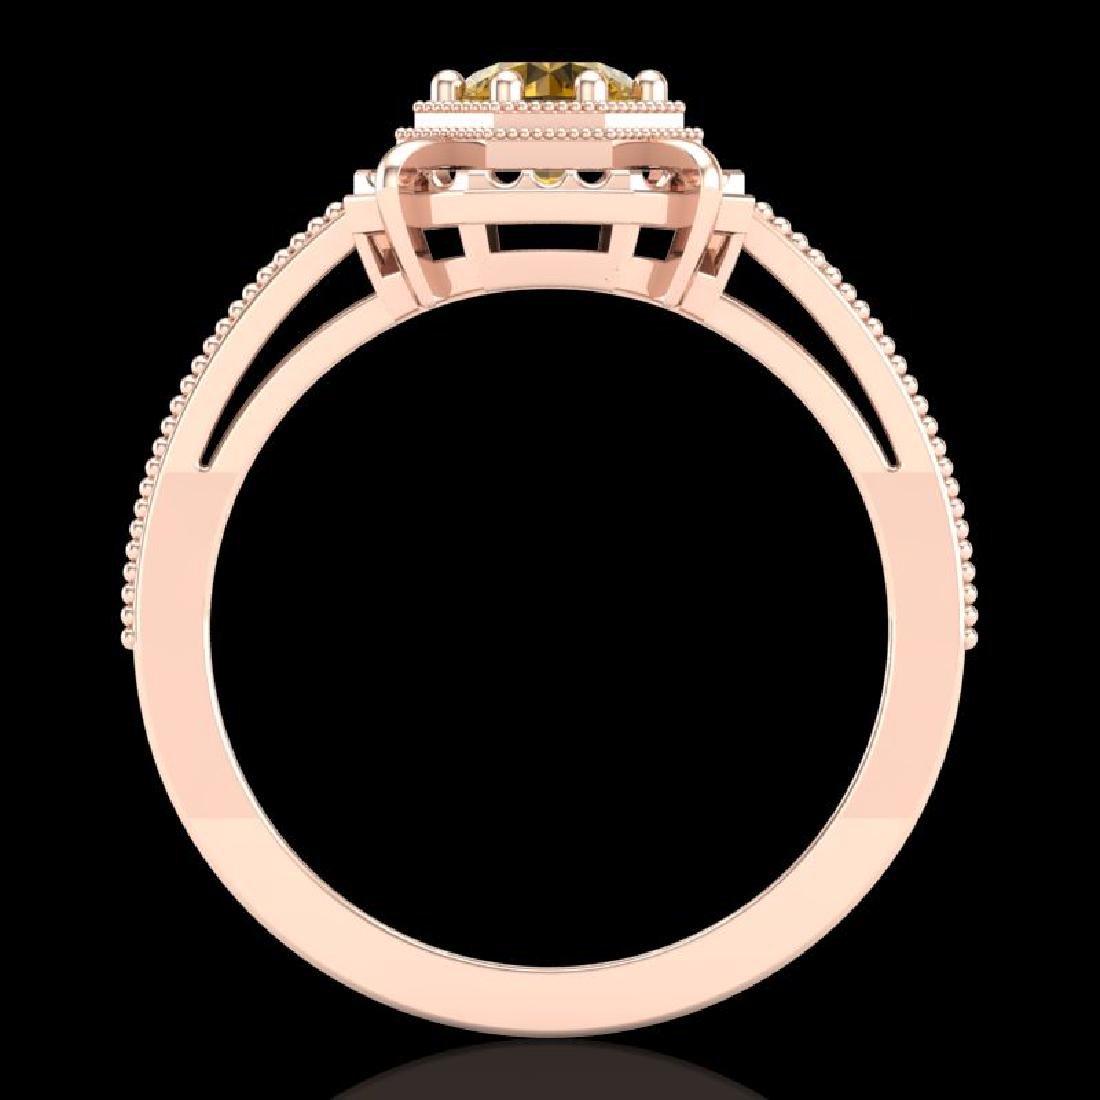 0.53 CTW Intense Fancy Yellow Diamond Engagement Art - 2